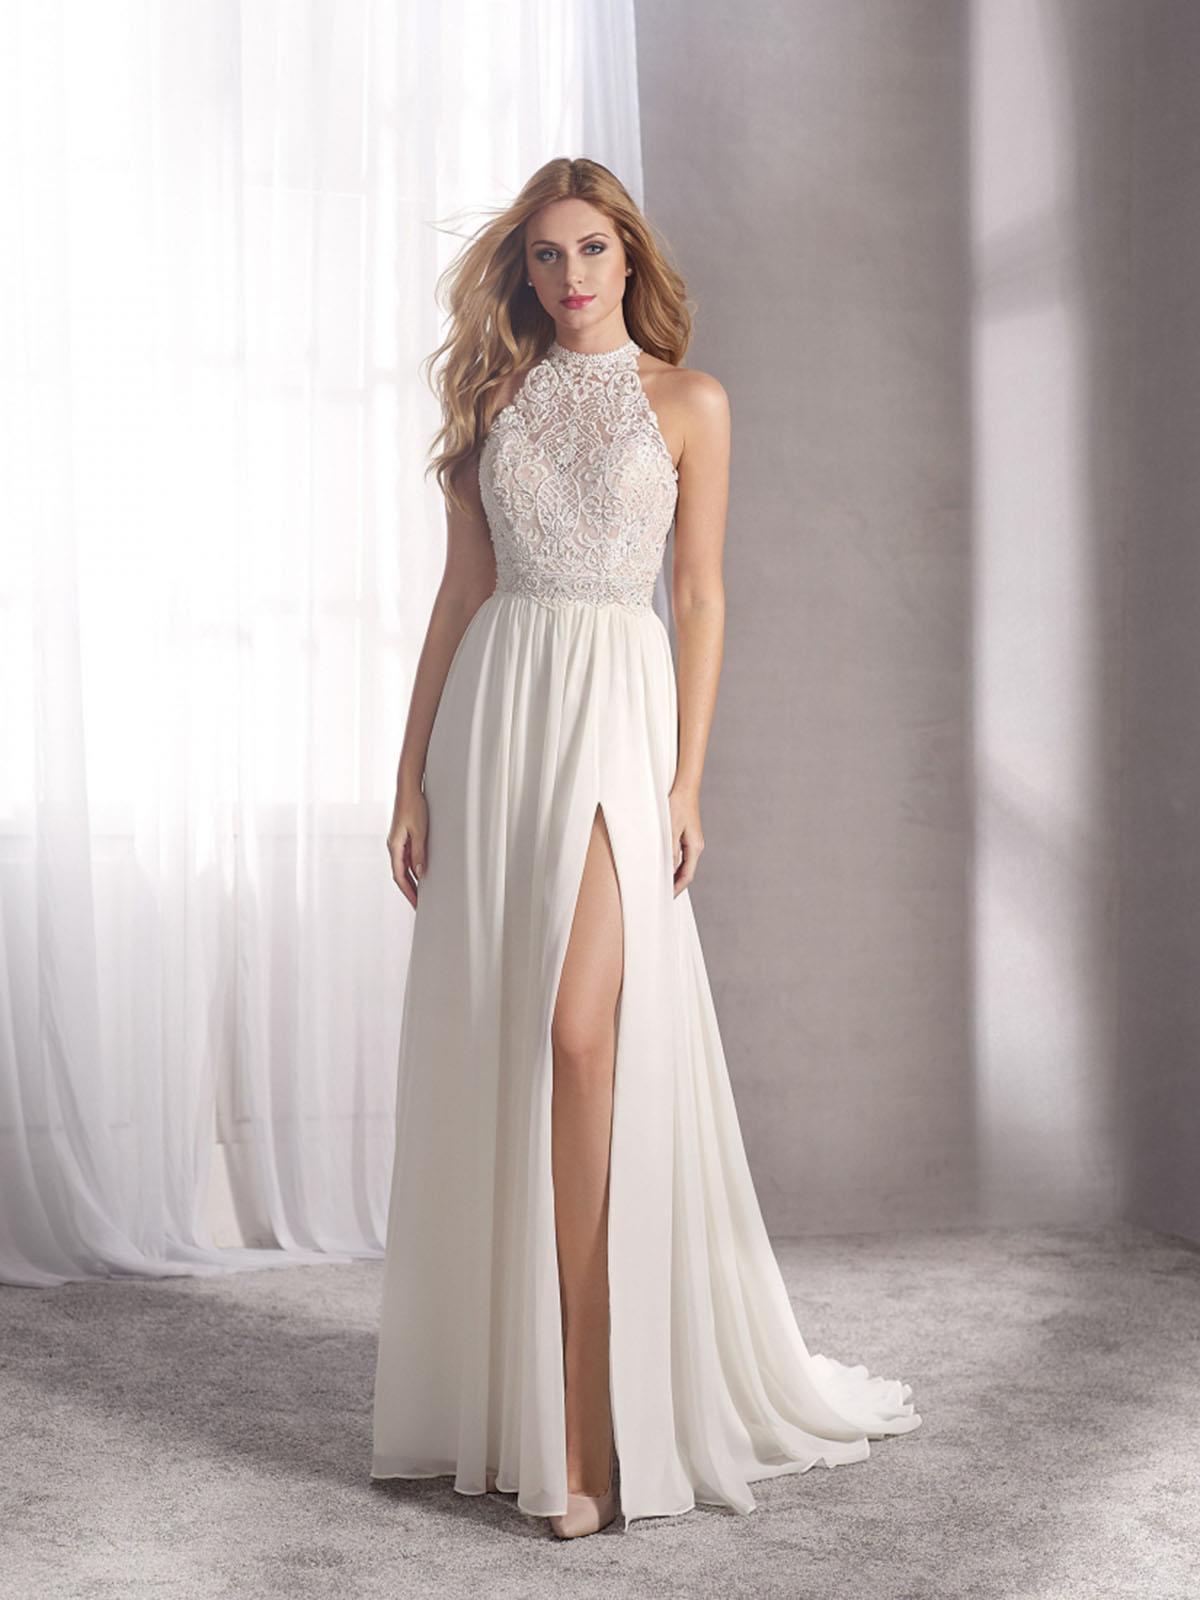 5e96330f5 Vestidos de novia de moda  Farasposa. Vestidos de novia de moda  Fara Sposa